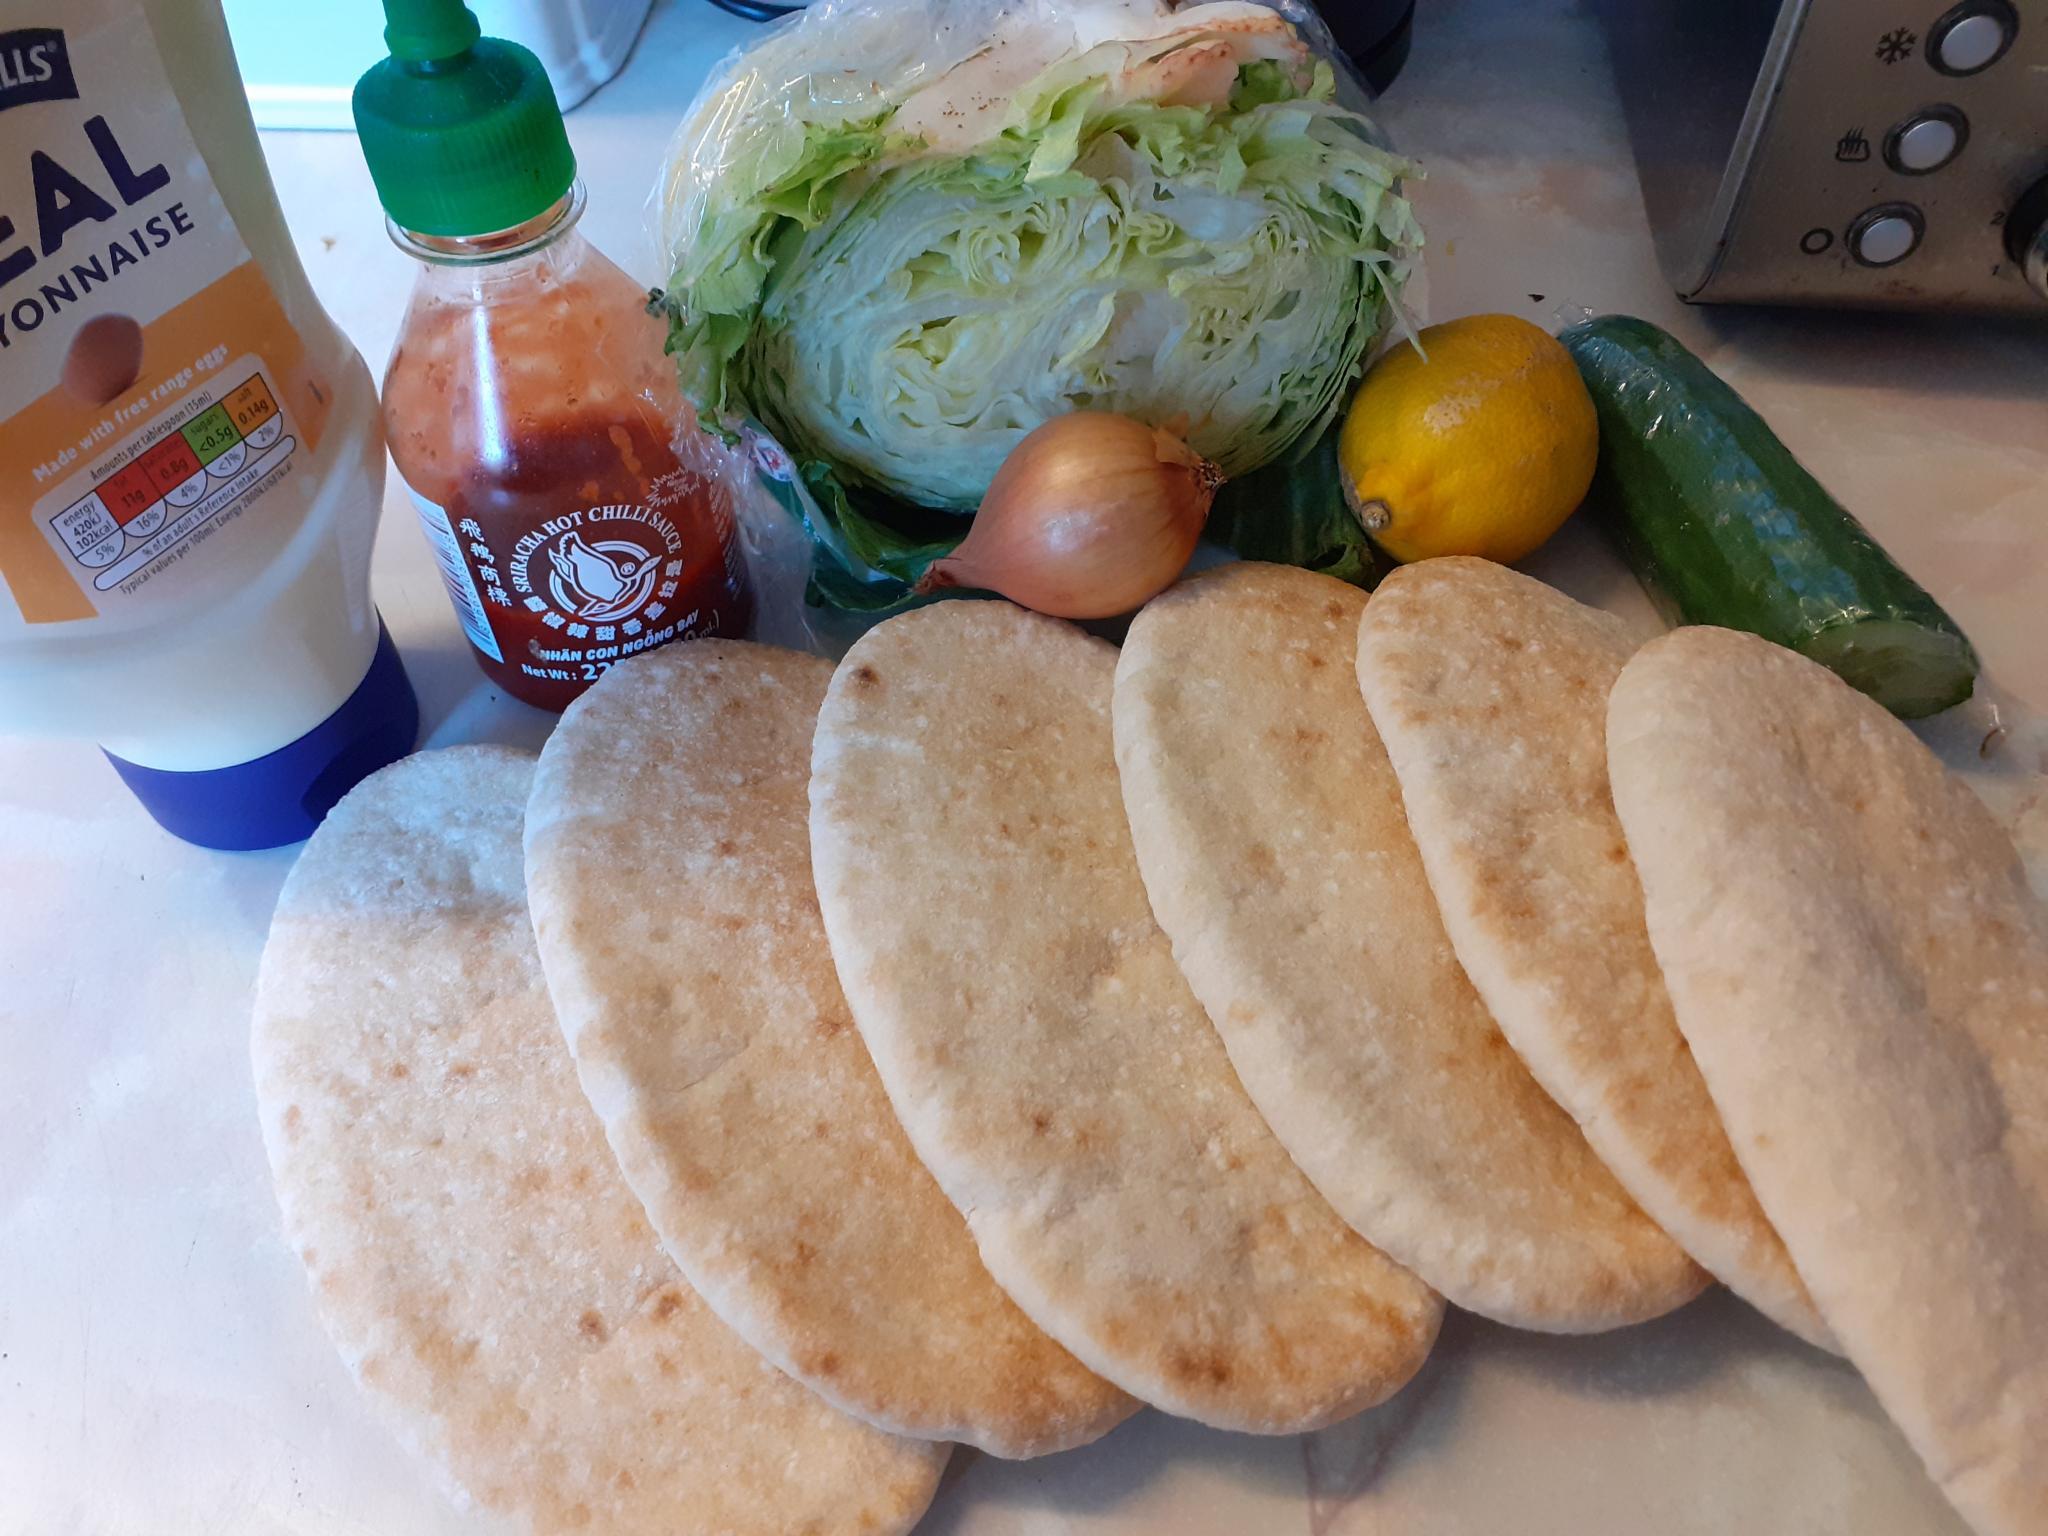 Chittys 5 minute half time dirty kebab-20200919_151802-jpg